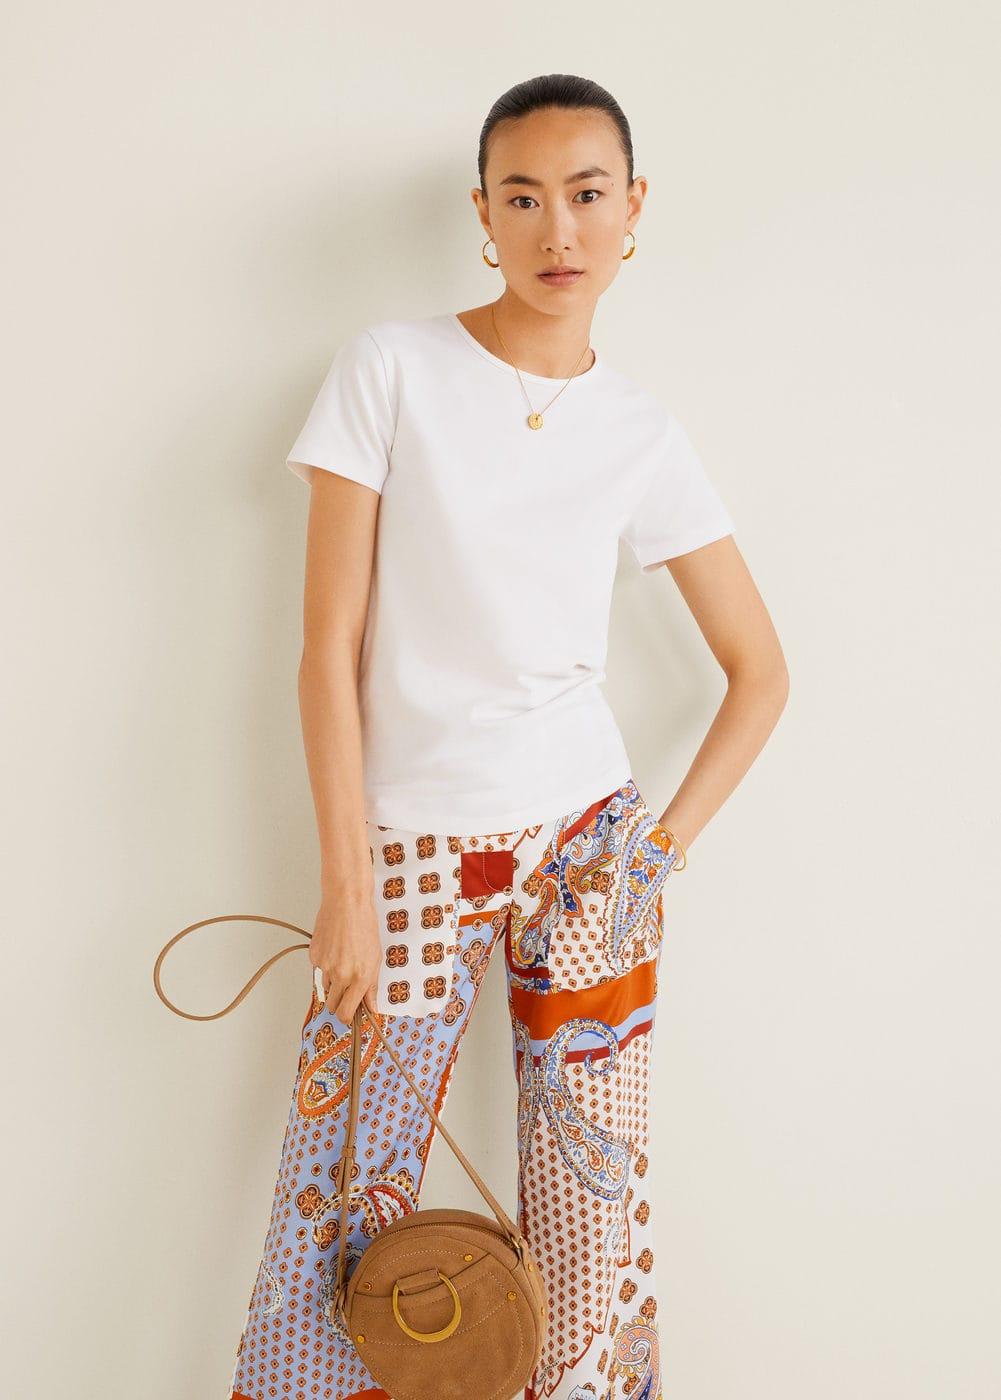 m-basic:camiseta basica algodon